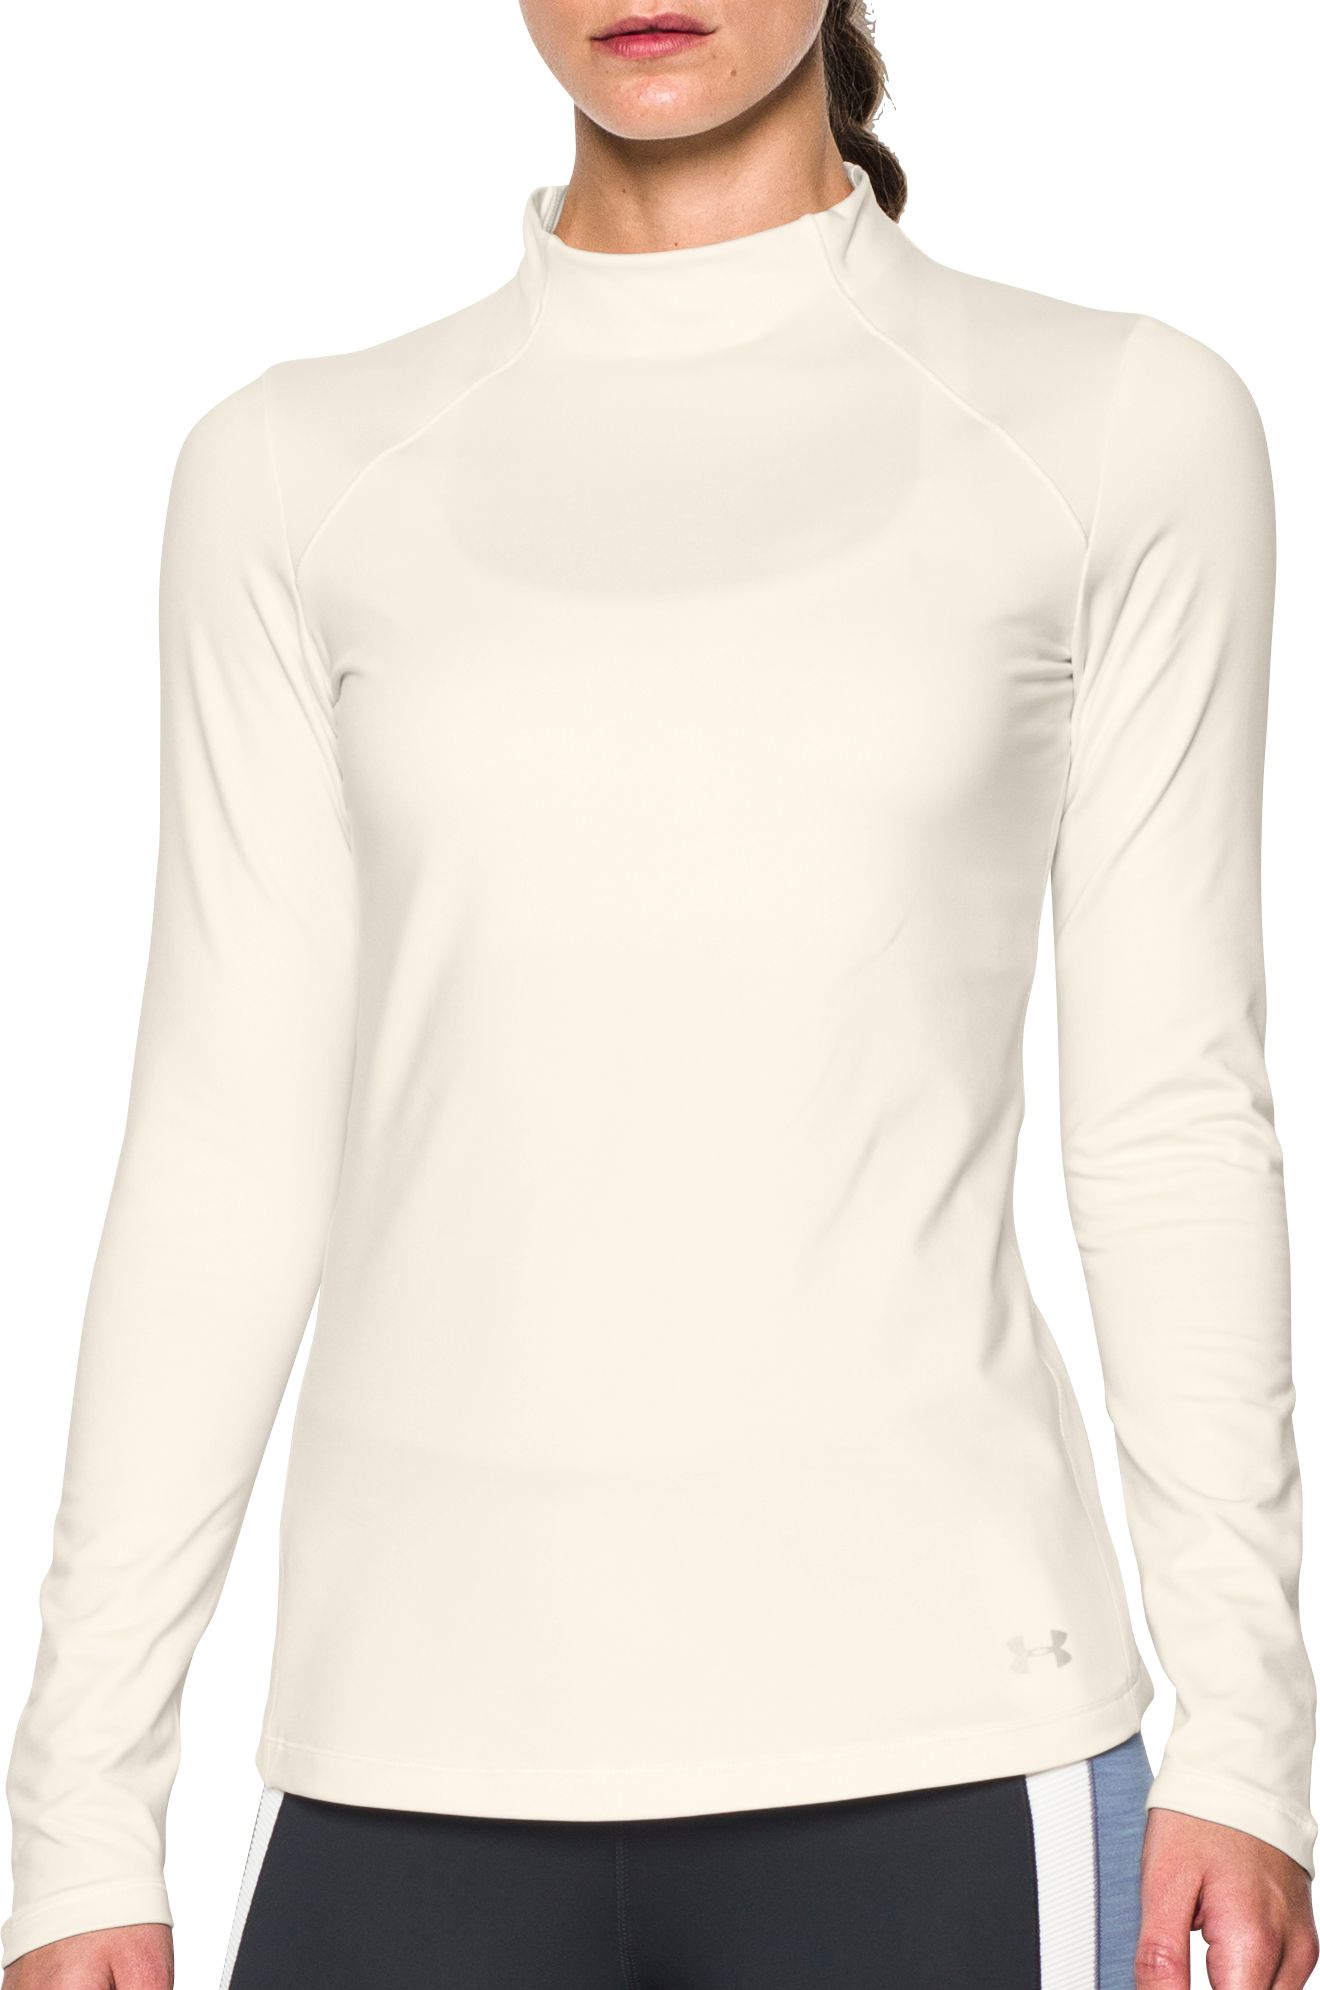 Under Armour Women's ColdGear Armour Mockneck Long Sleeve Shirt, Size: Medium, Ivory thumbnail